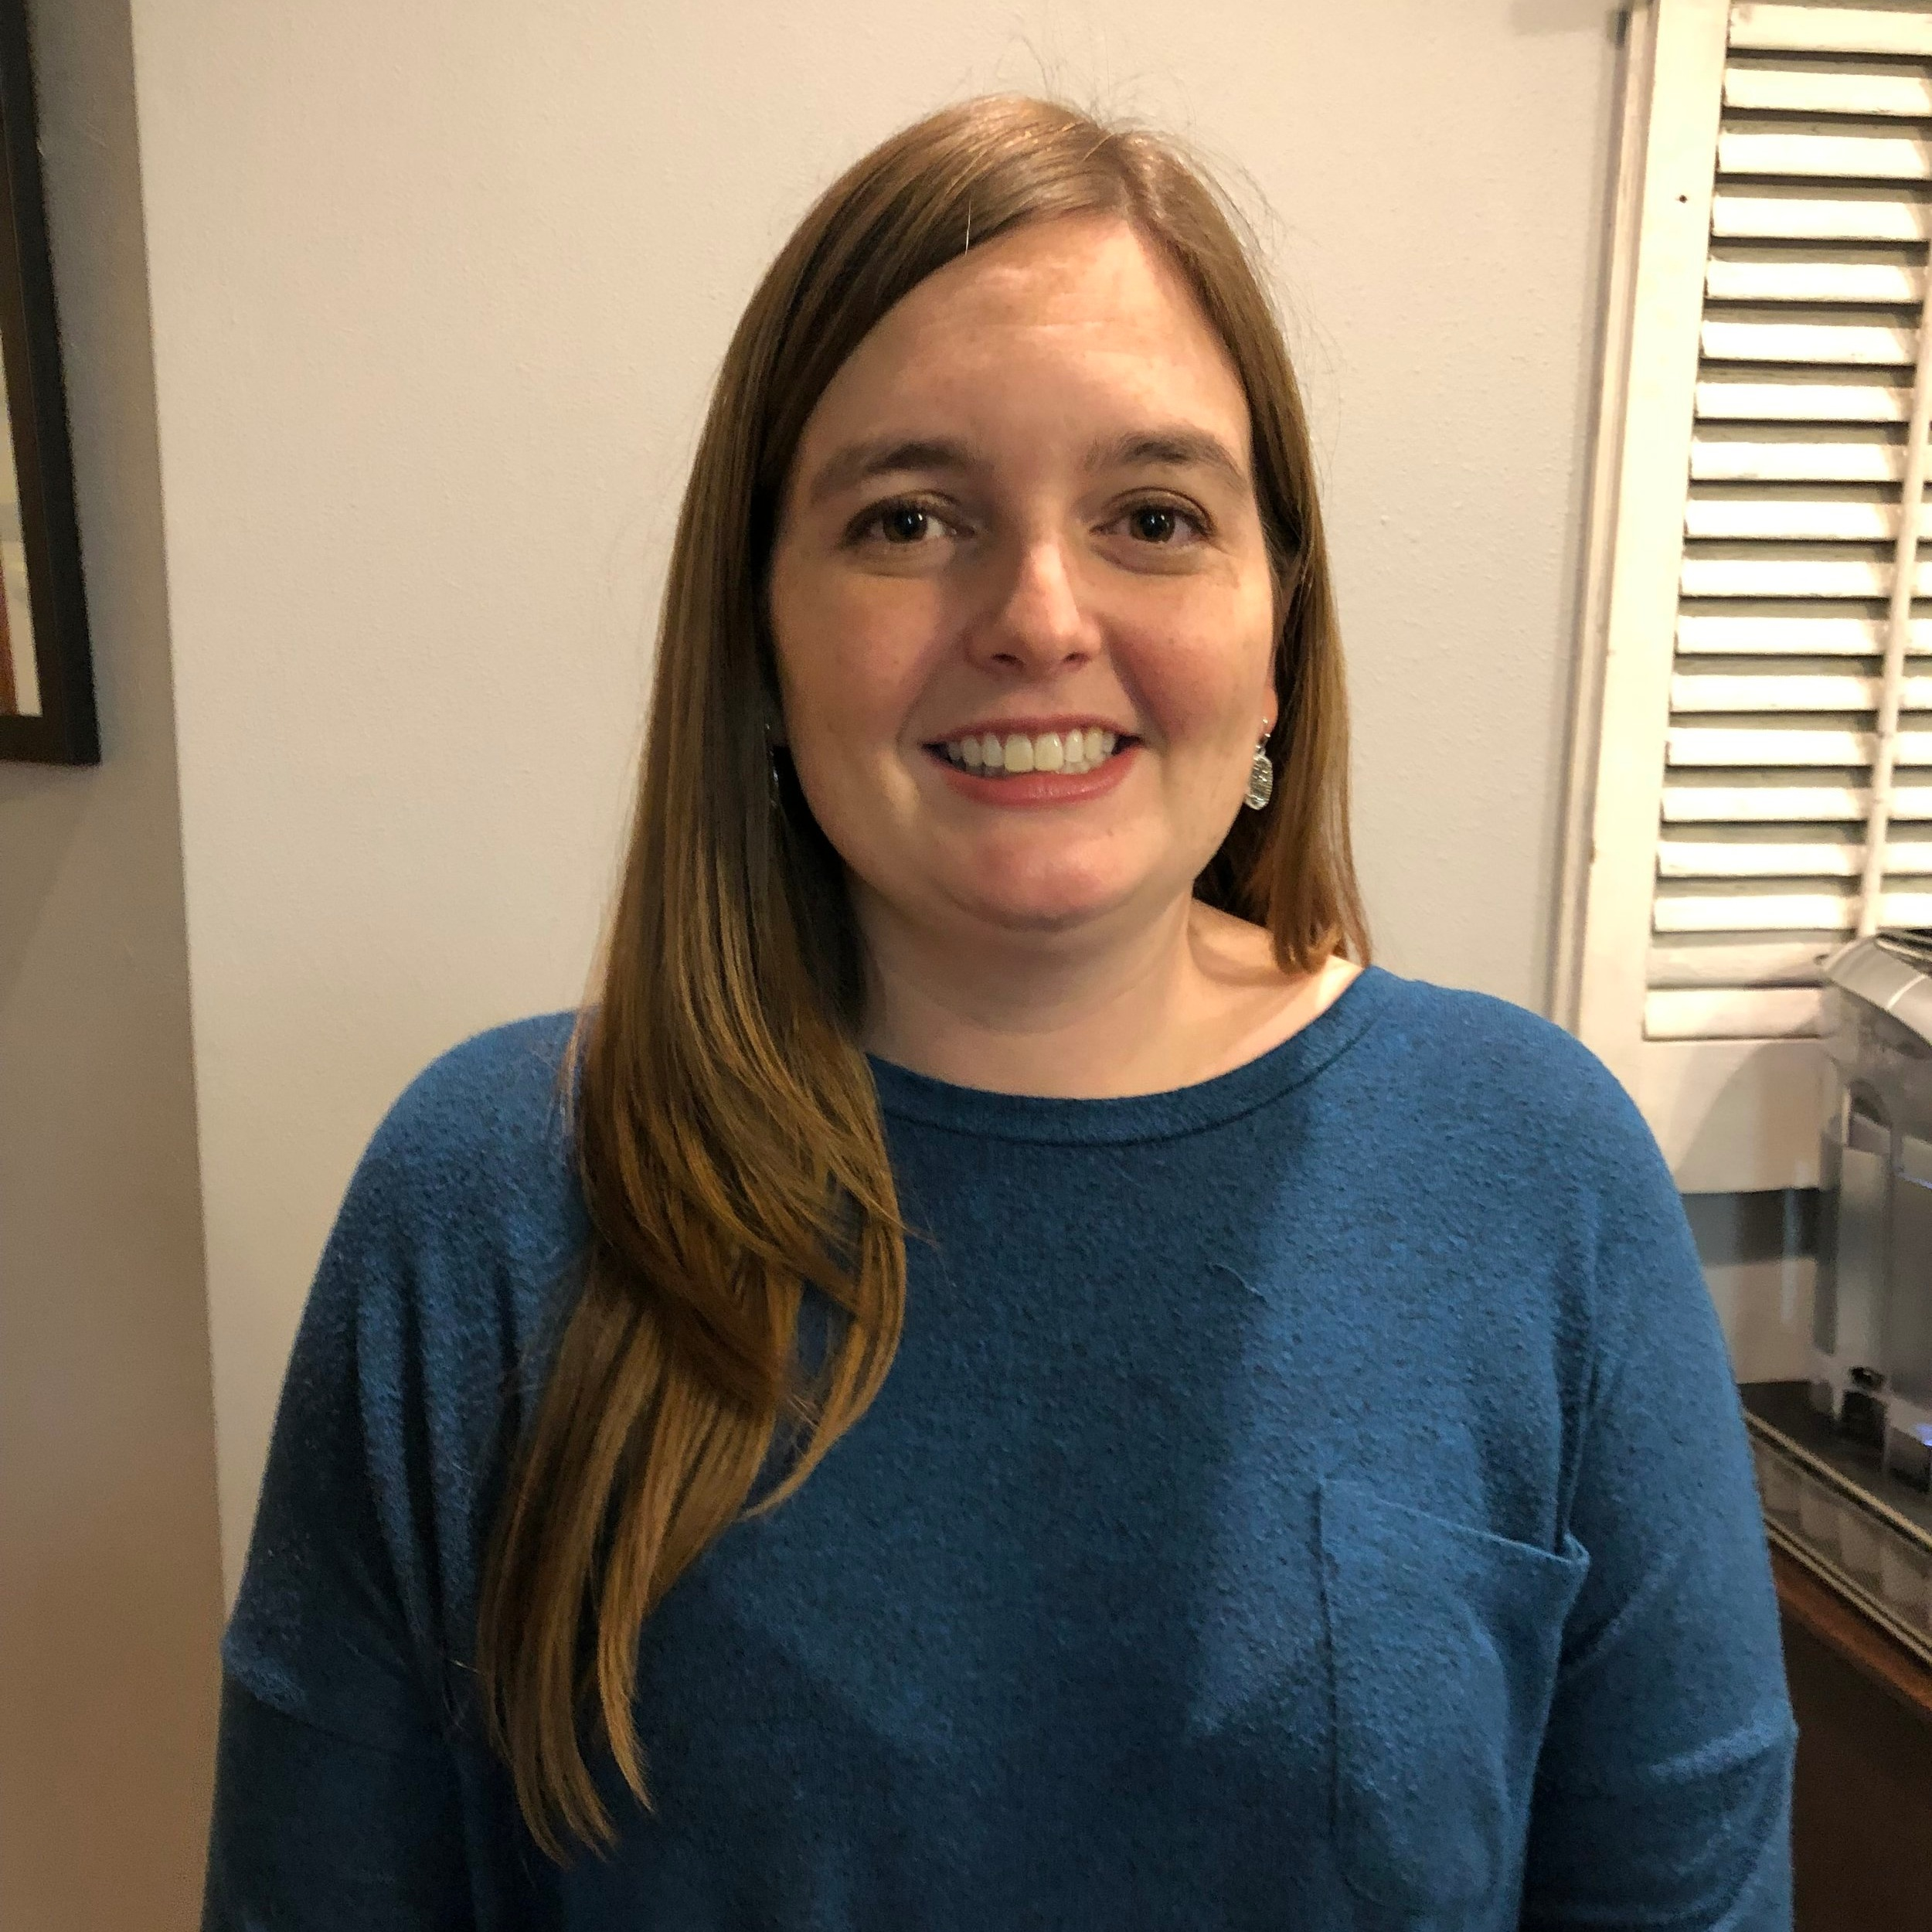 Sarah Chrestman - Director of Community Affairss.k.chrestman@gmail.com